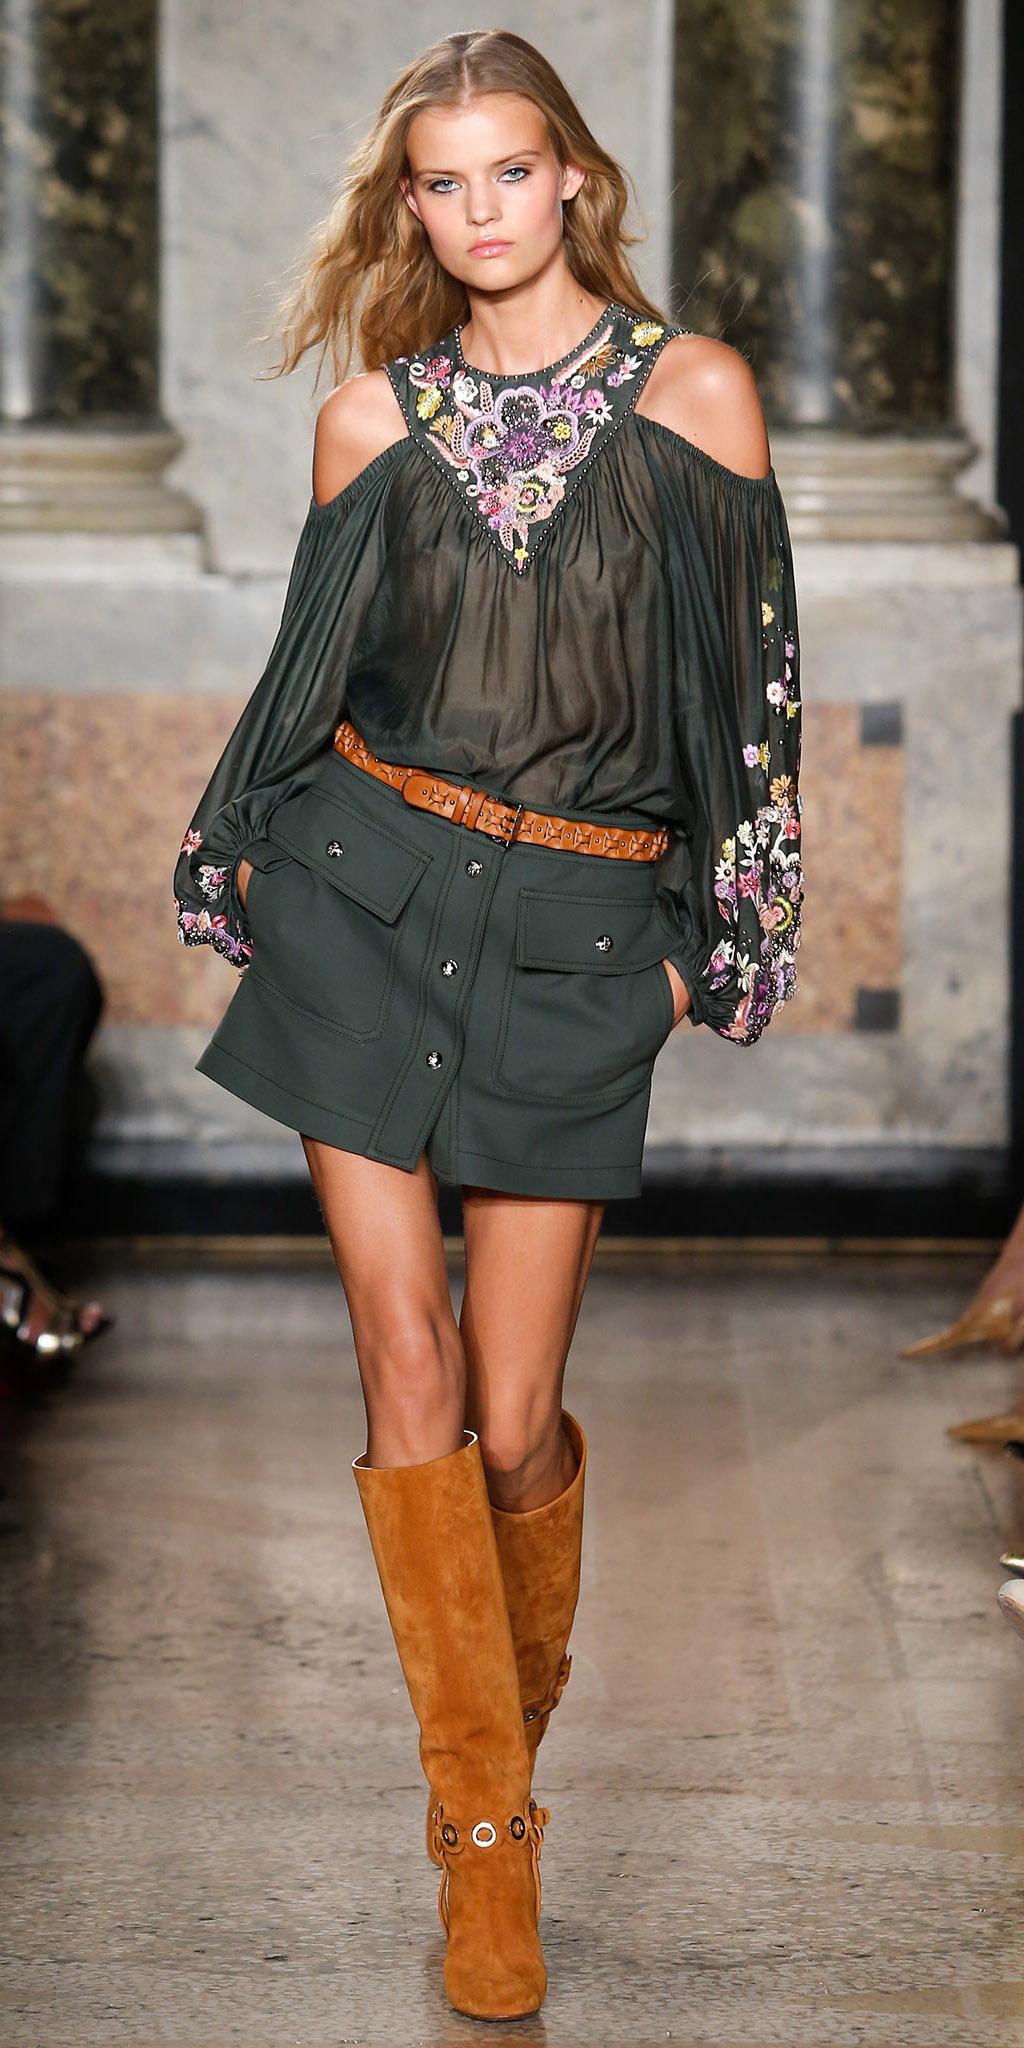 green-dark-mini-skirt-green-dark-top-blouse-peasant-belt-blonde-camel-shoe-boots-spring-summer-lunch.jpg